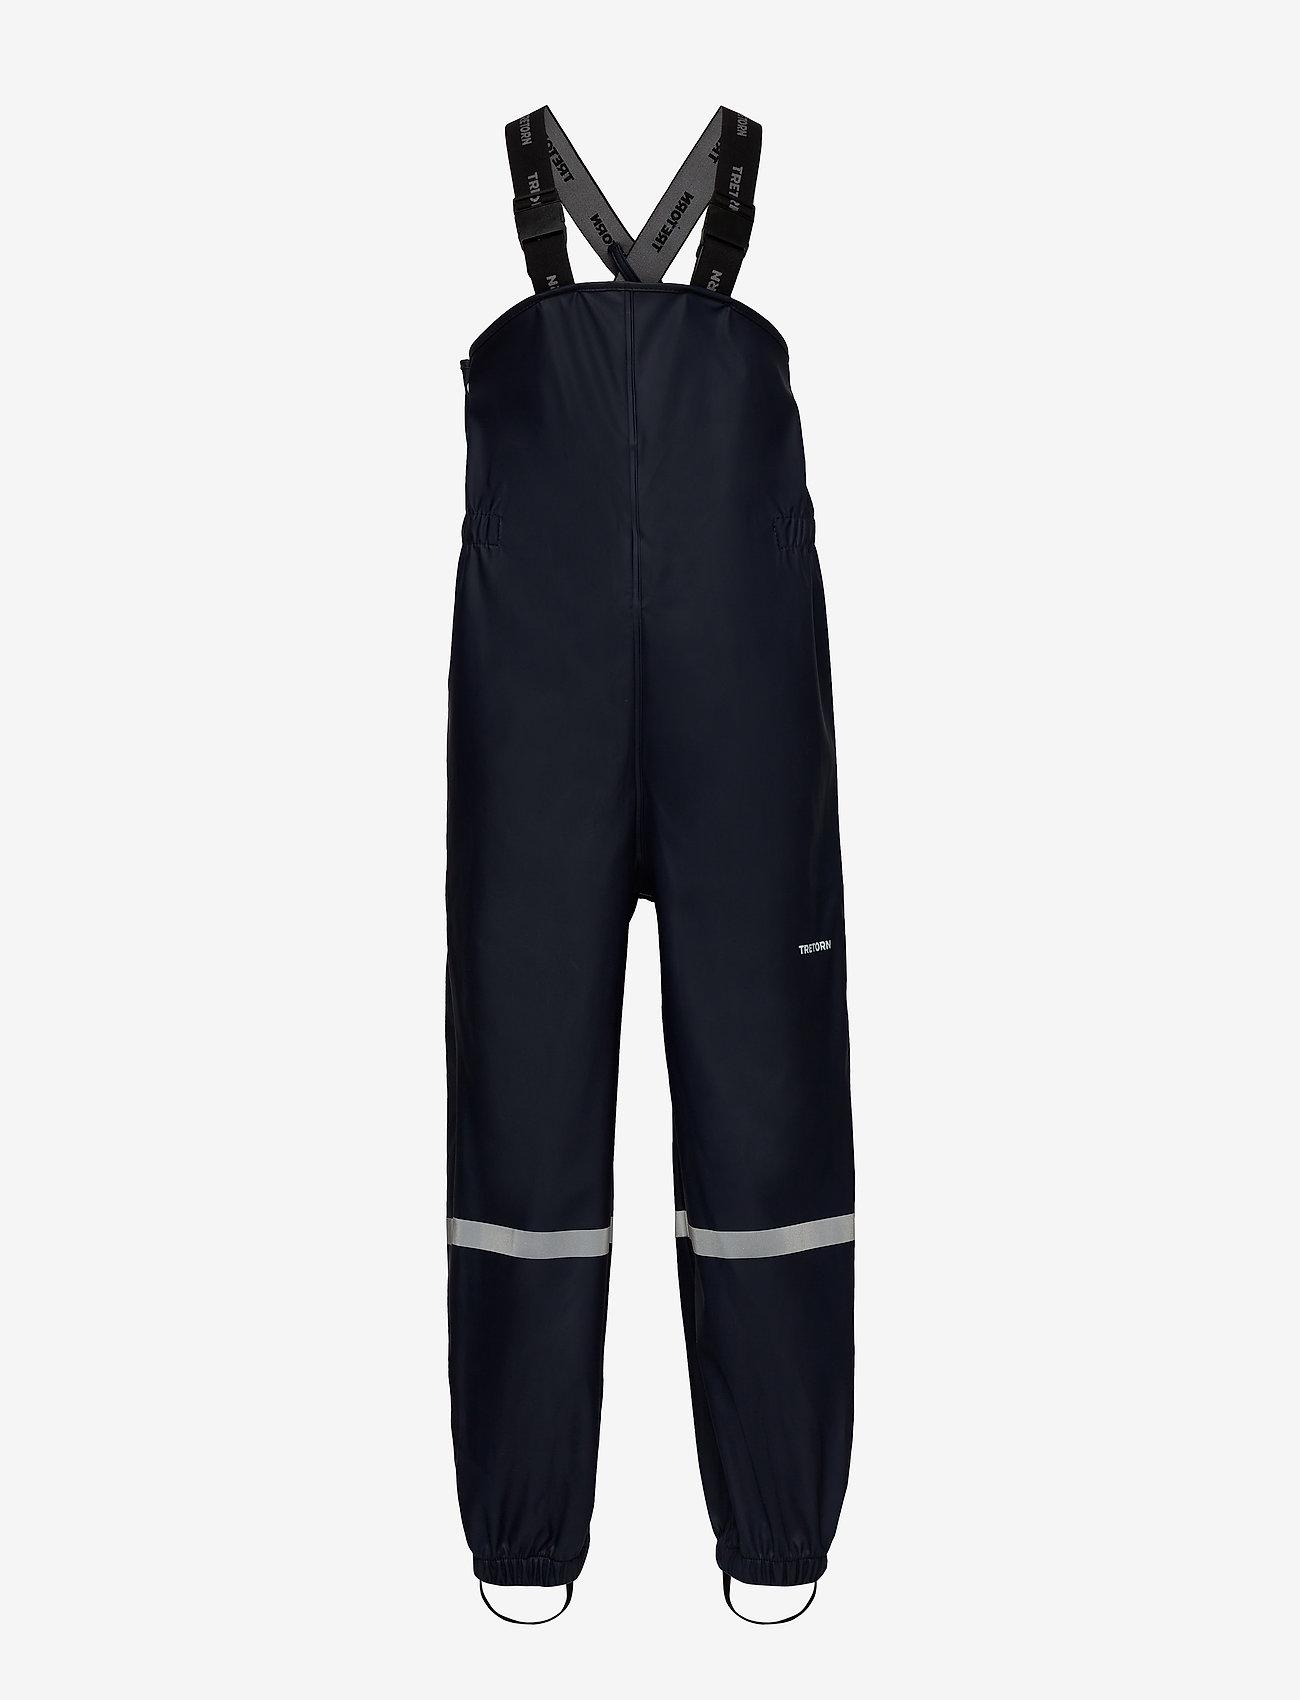 Tretorn - KIDS WINGS HIGH RAINPANTS - pantalons - 080/navy - 0